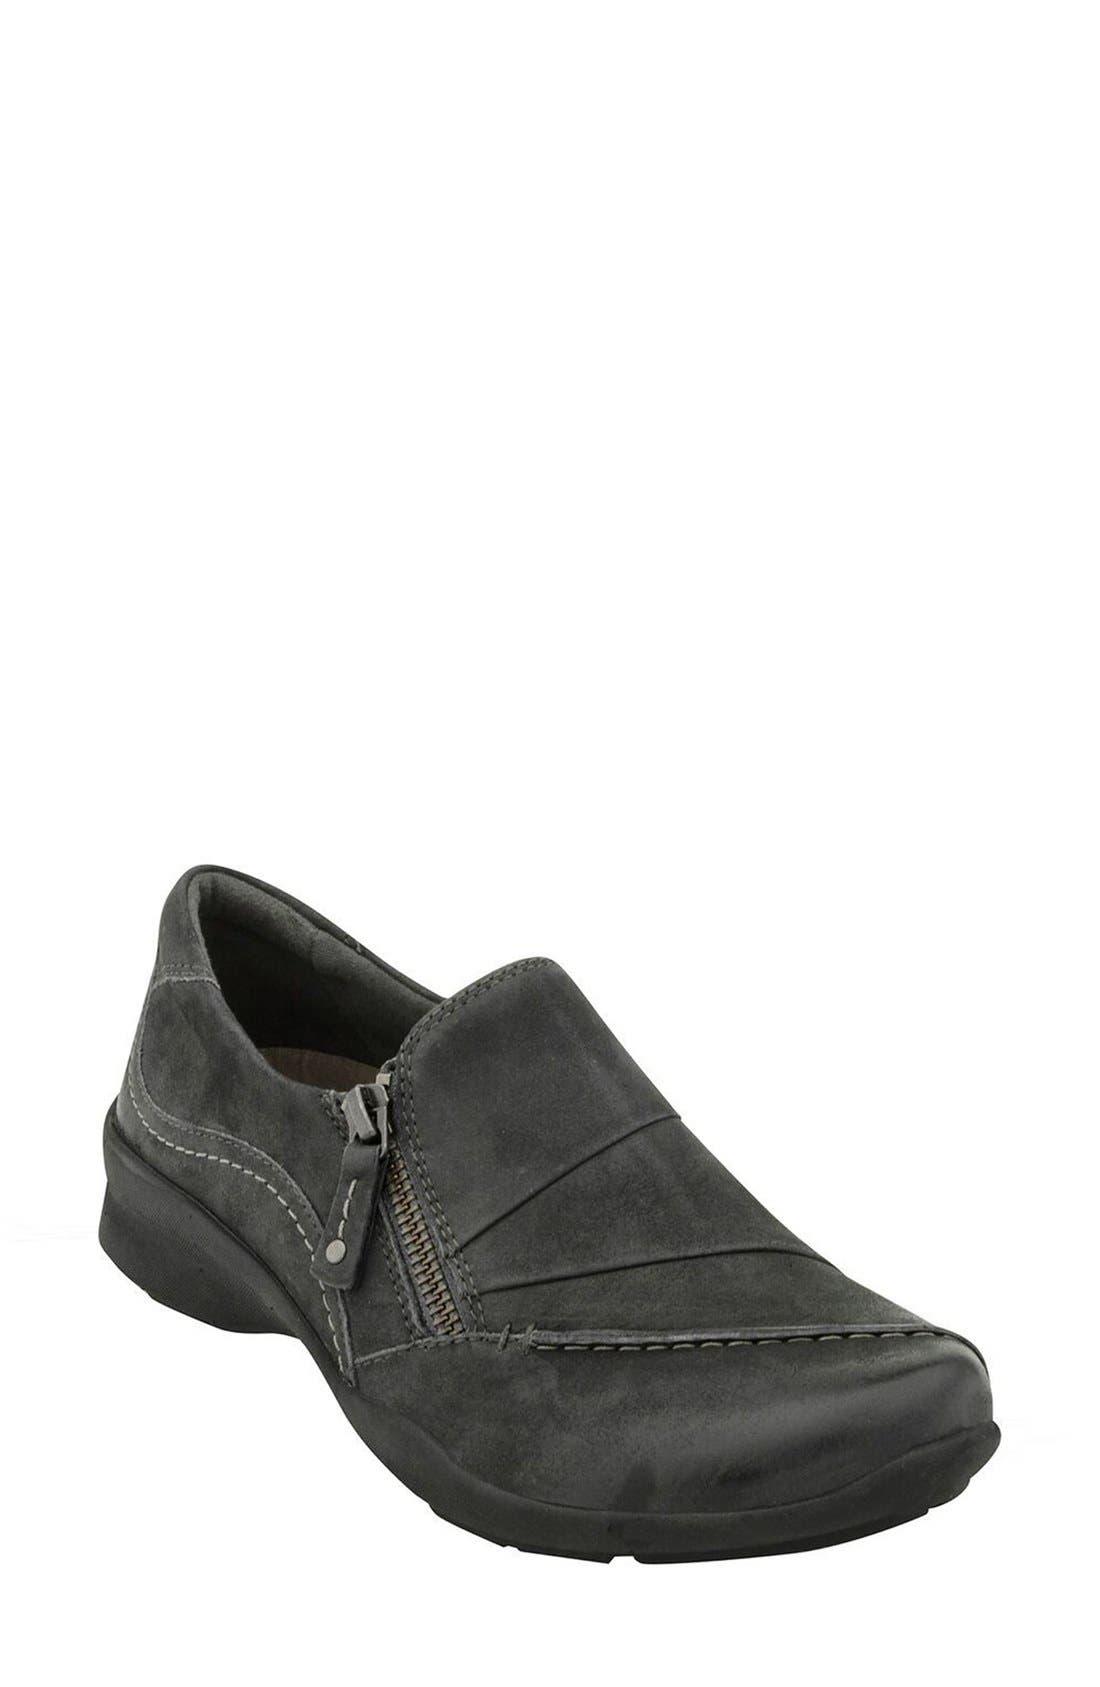 'Anise' Slip-On Sneaker,                             Main thumbnail 1, color,                             Dark Grey Nubuck Leather